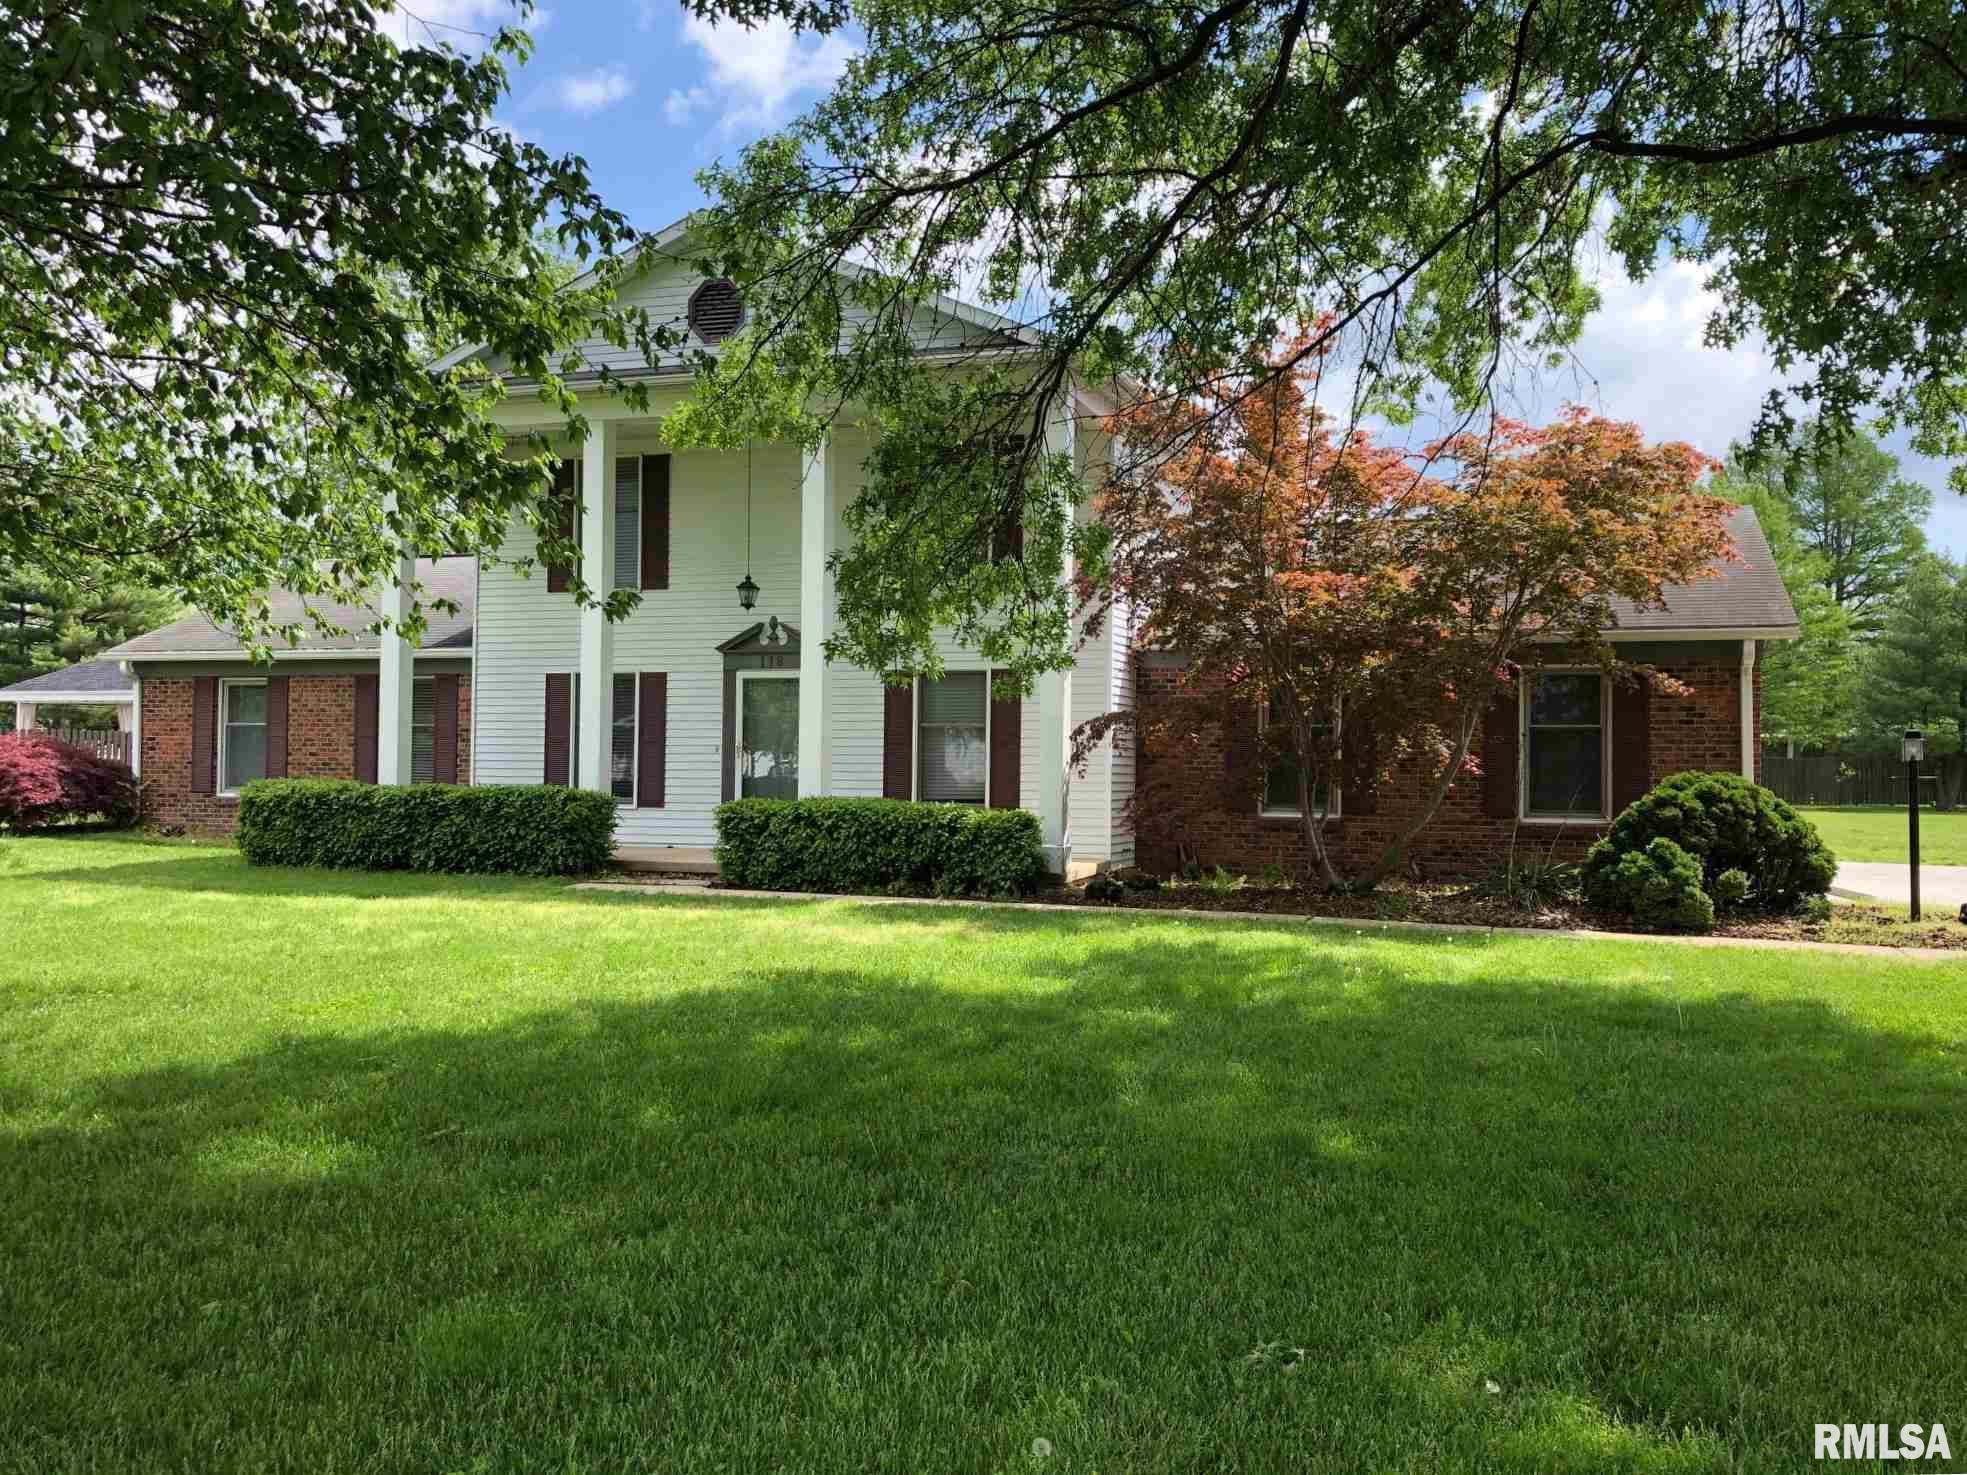 118 HAWTHORNE Property Photo - Salem, IL real estate listing